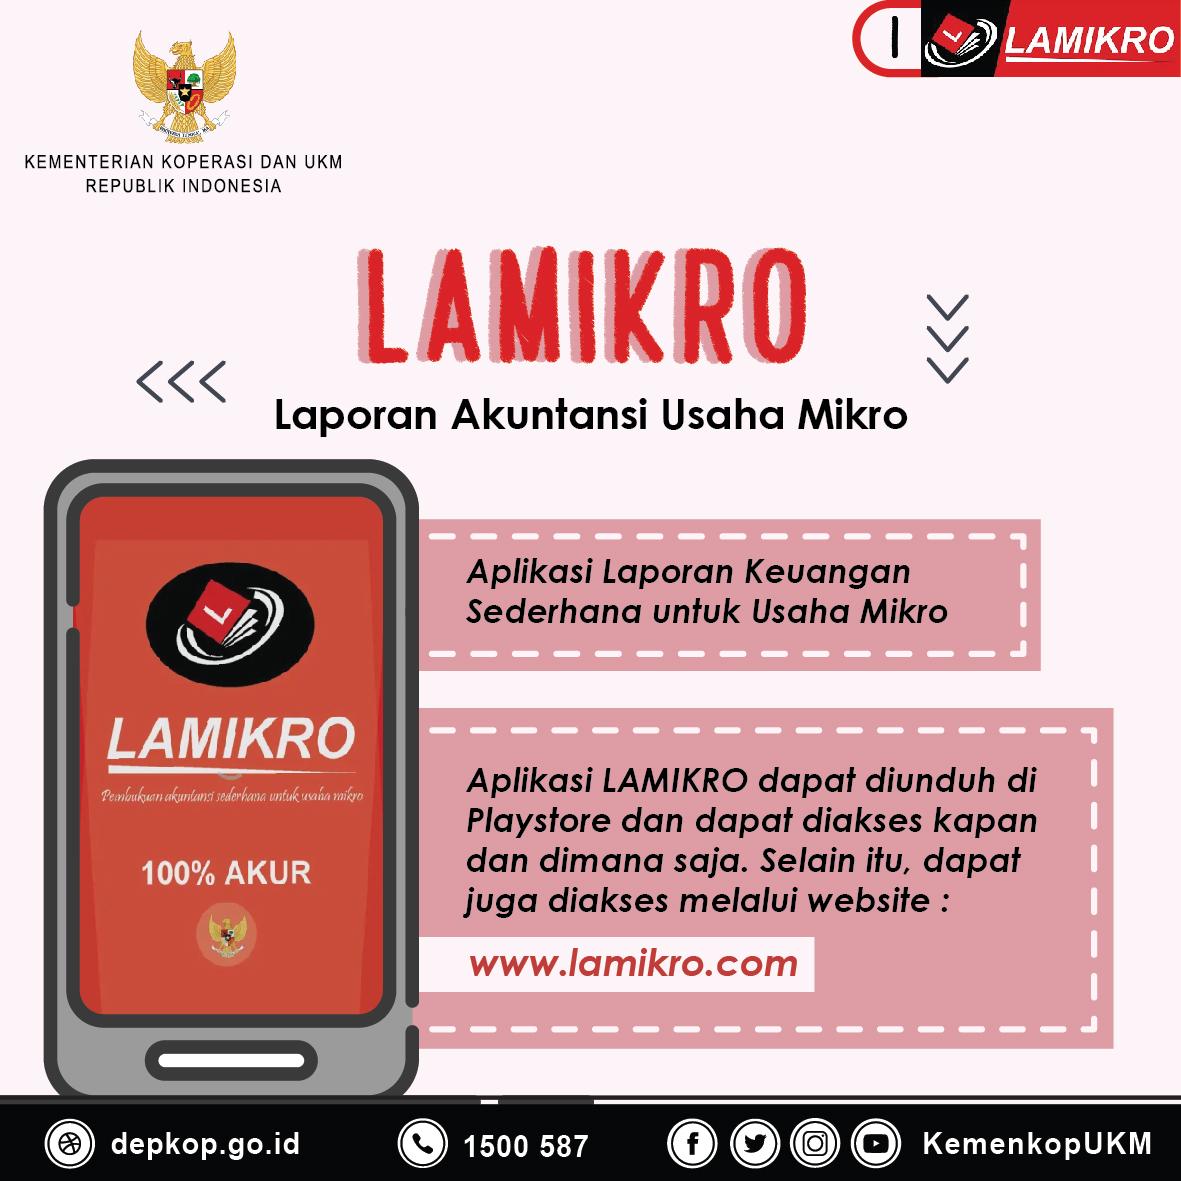 Lamikro Aplikasi Laporan Keuangan Sederhana Untuk Usaha Mikro Produk Ukm Bumn Batik Tulis Warna Alam Ra Ampamp Jakarta Jumlah Di Tanah Air Saat Ini Mencapai 59 Juta Unit Para Pelaku Tersebut Umumnya Belum Memiliki Tata Kelola